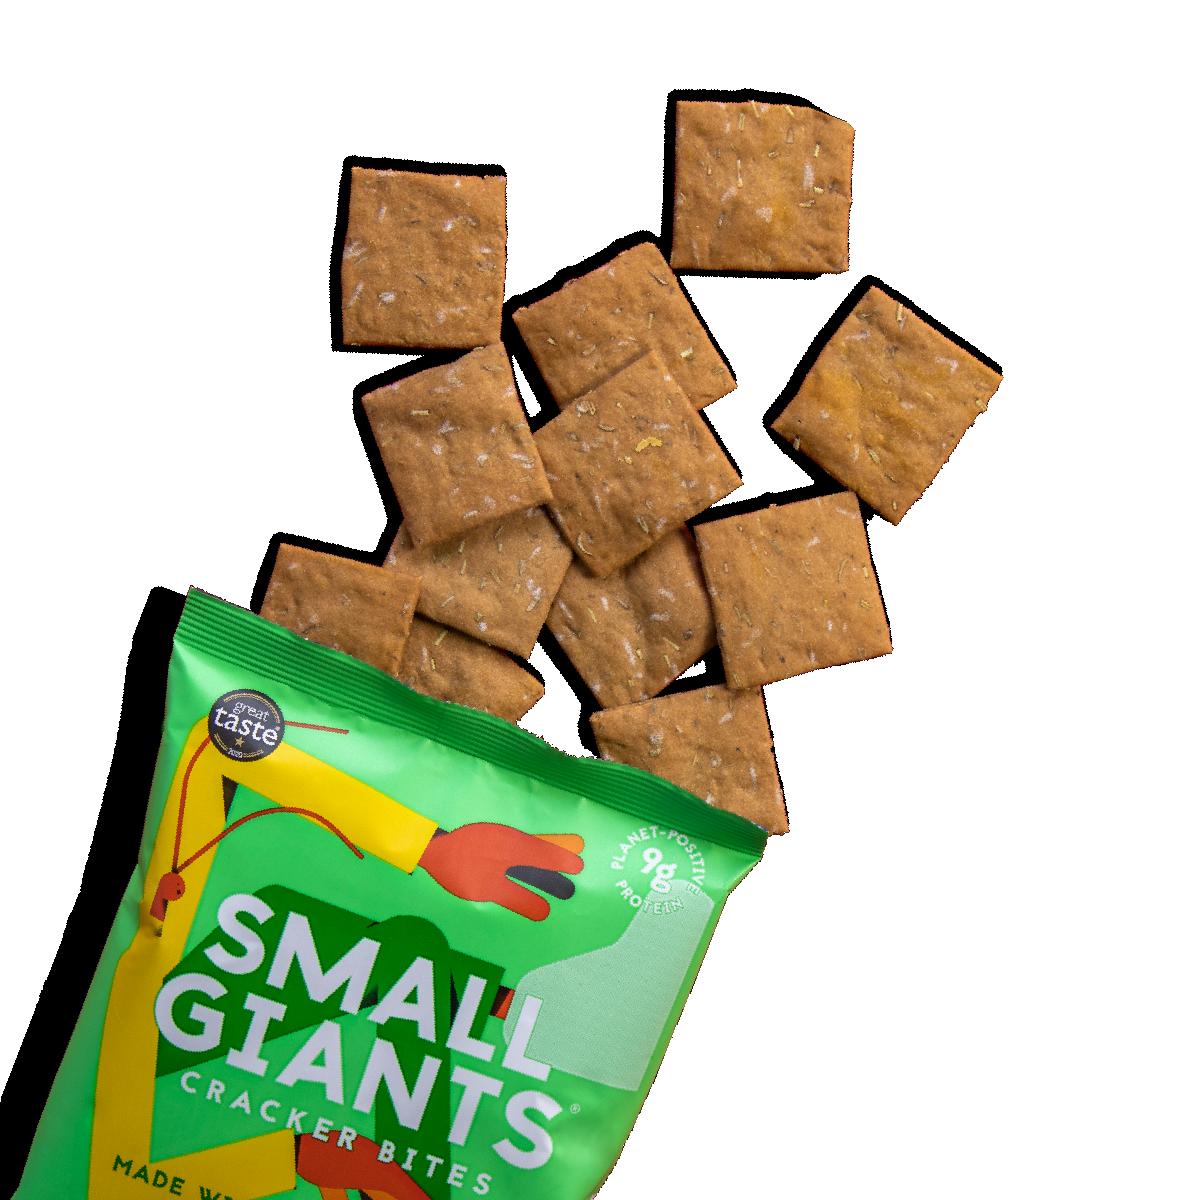 Cricket powder thyme and oregano crackers